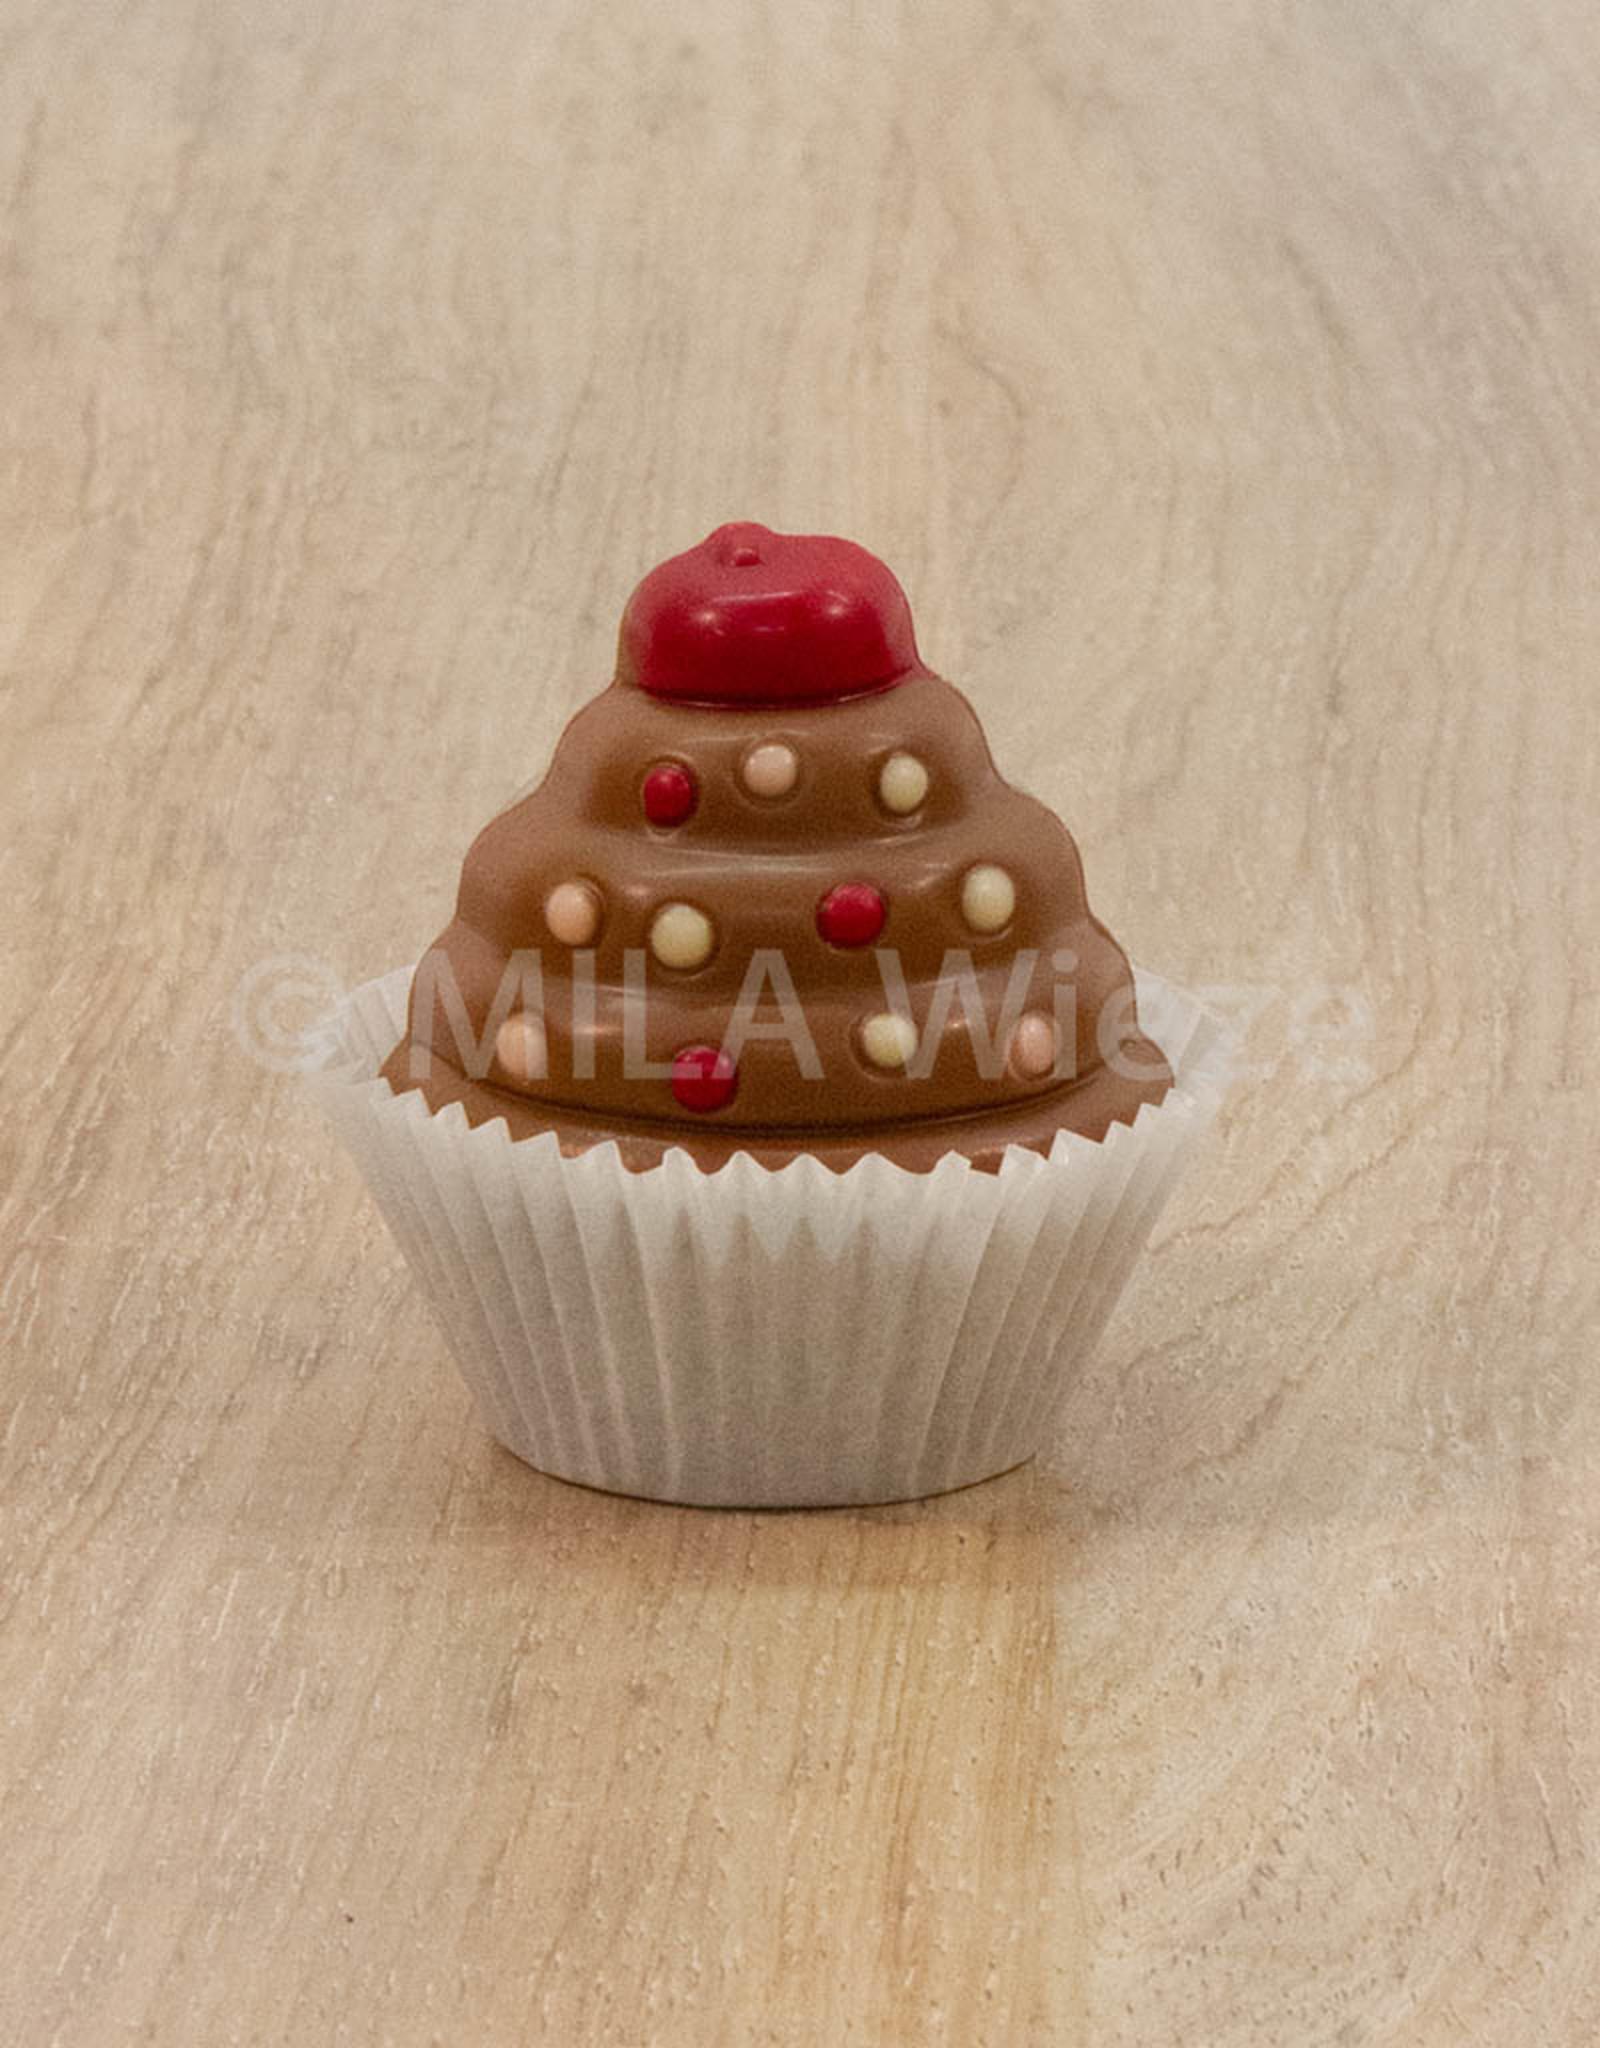 Cup cake deco - 30 gr - 7 cm - melkchocolade